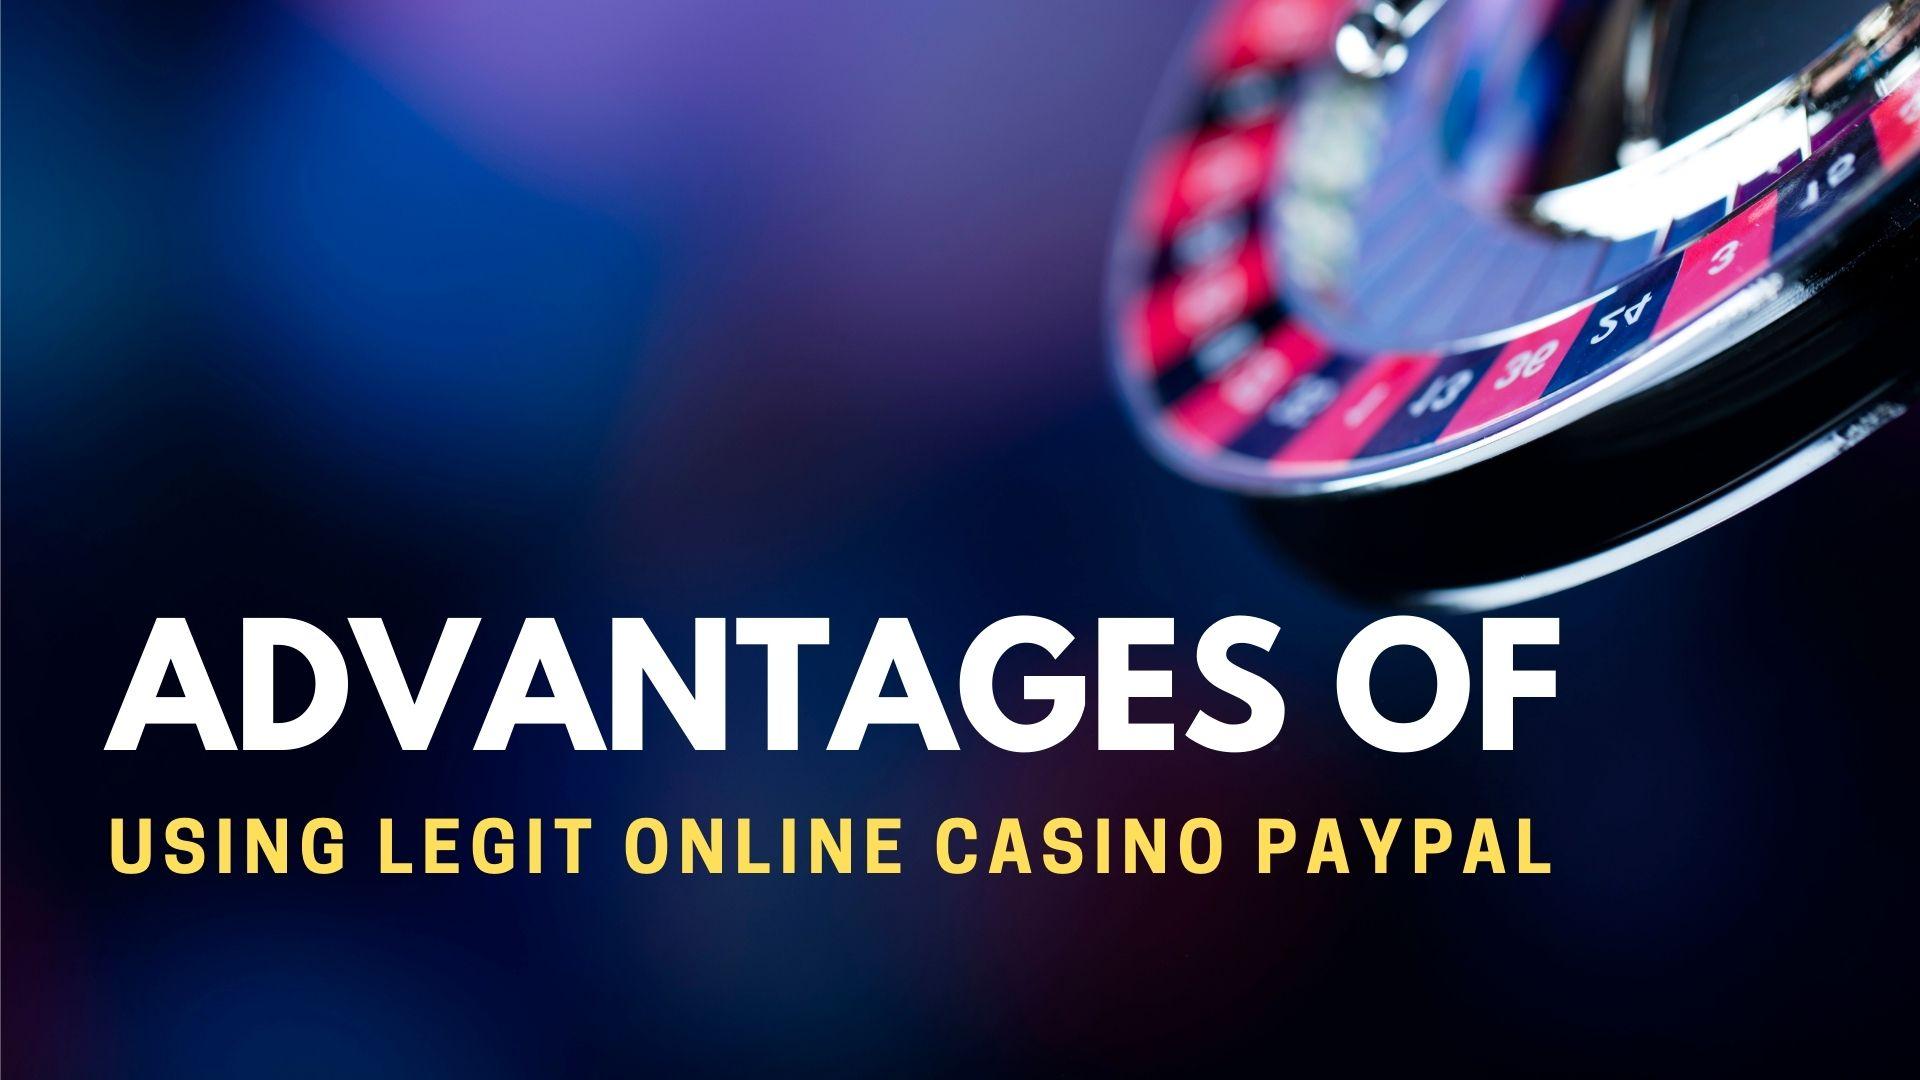 Advantages Of Using Legit Online Casino Paypal